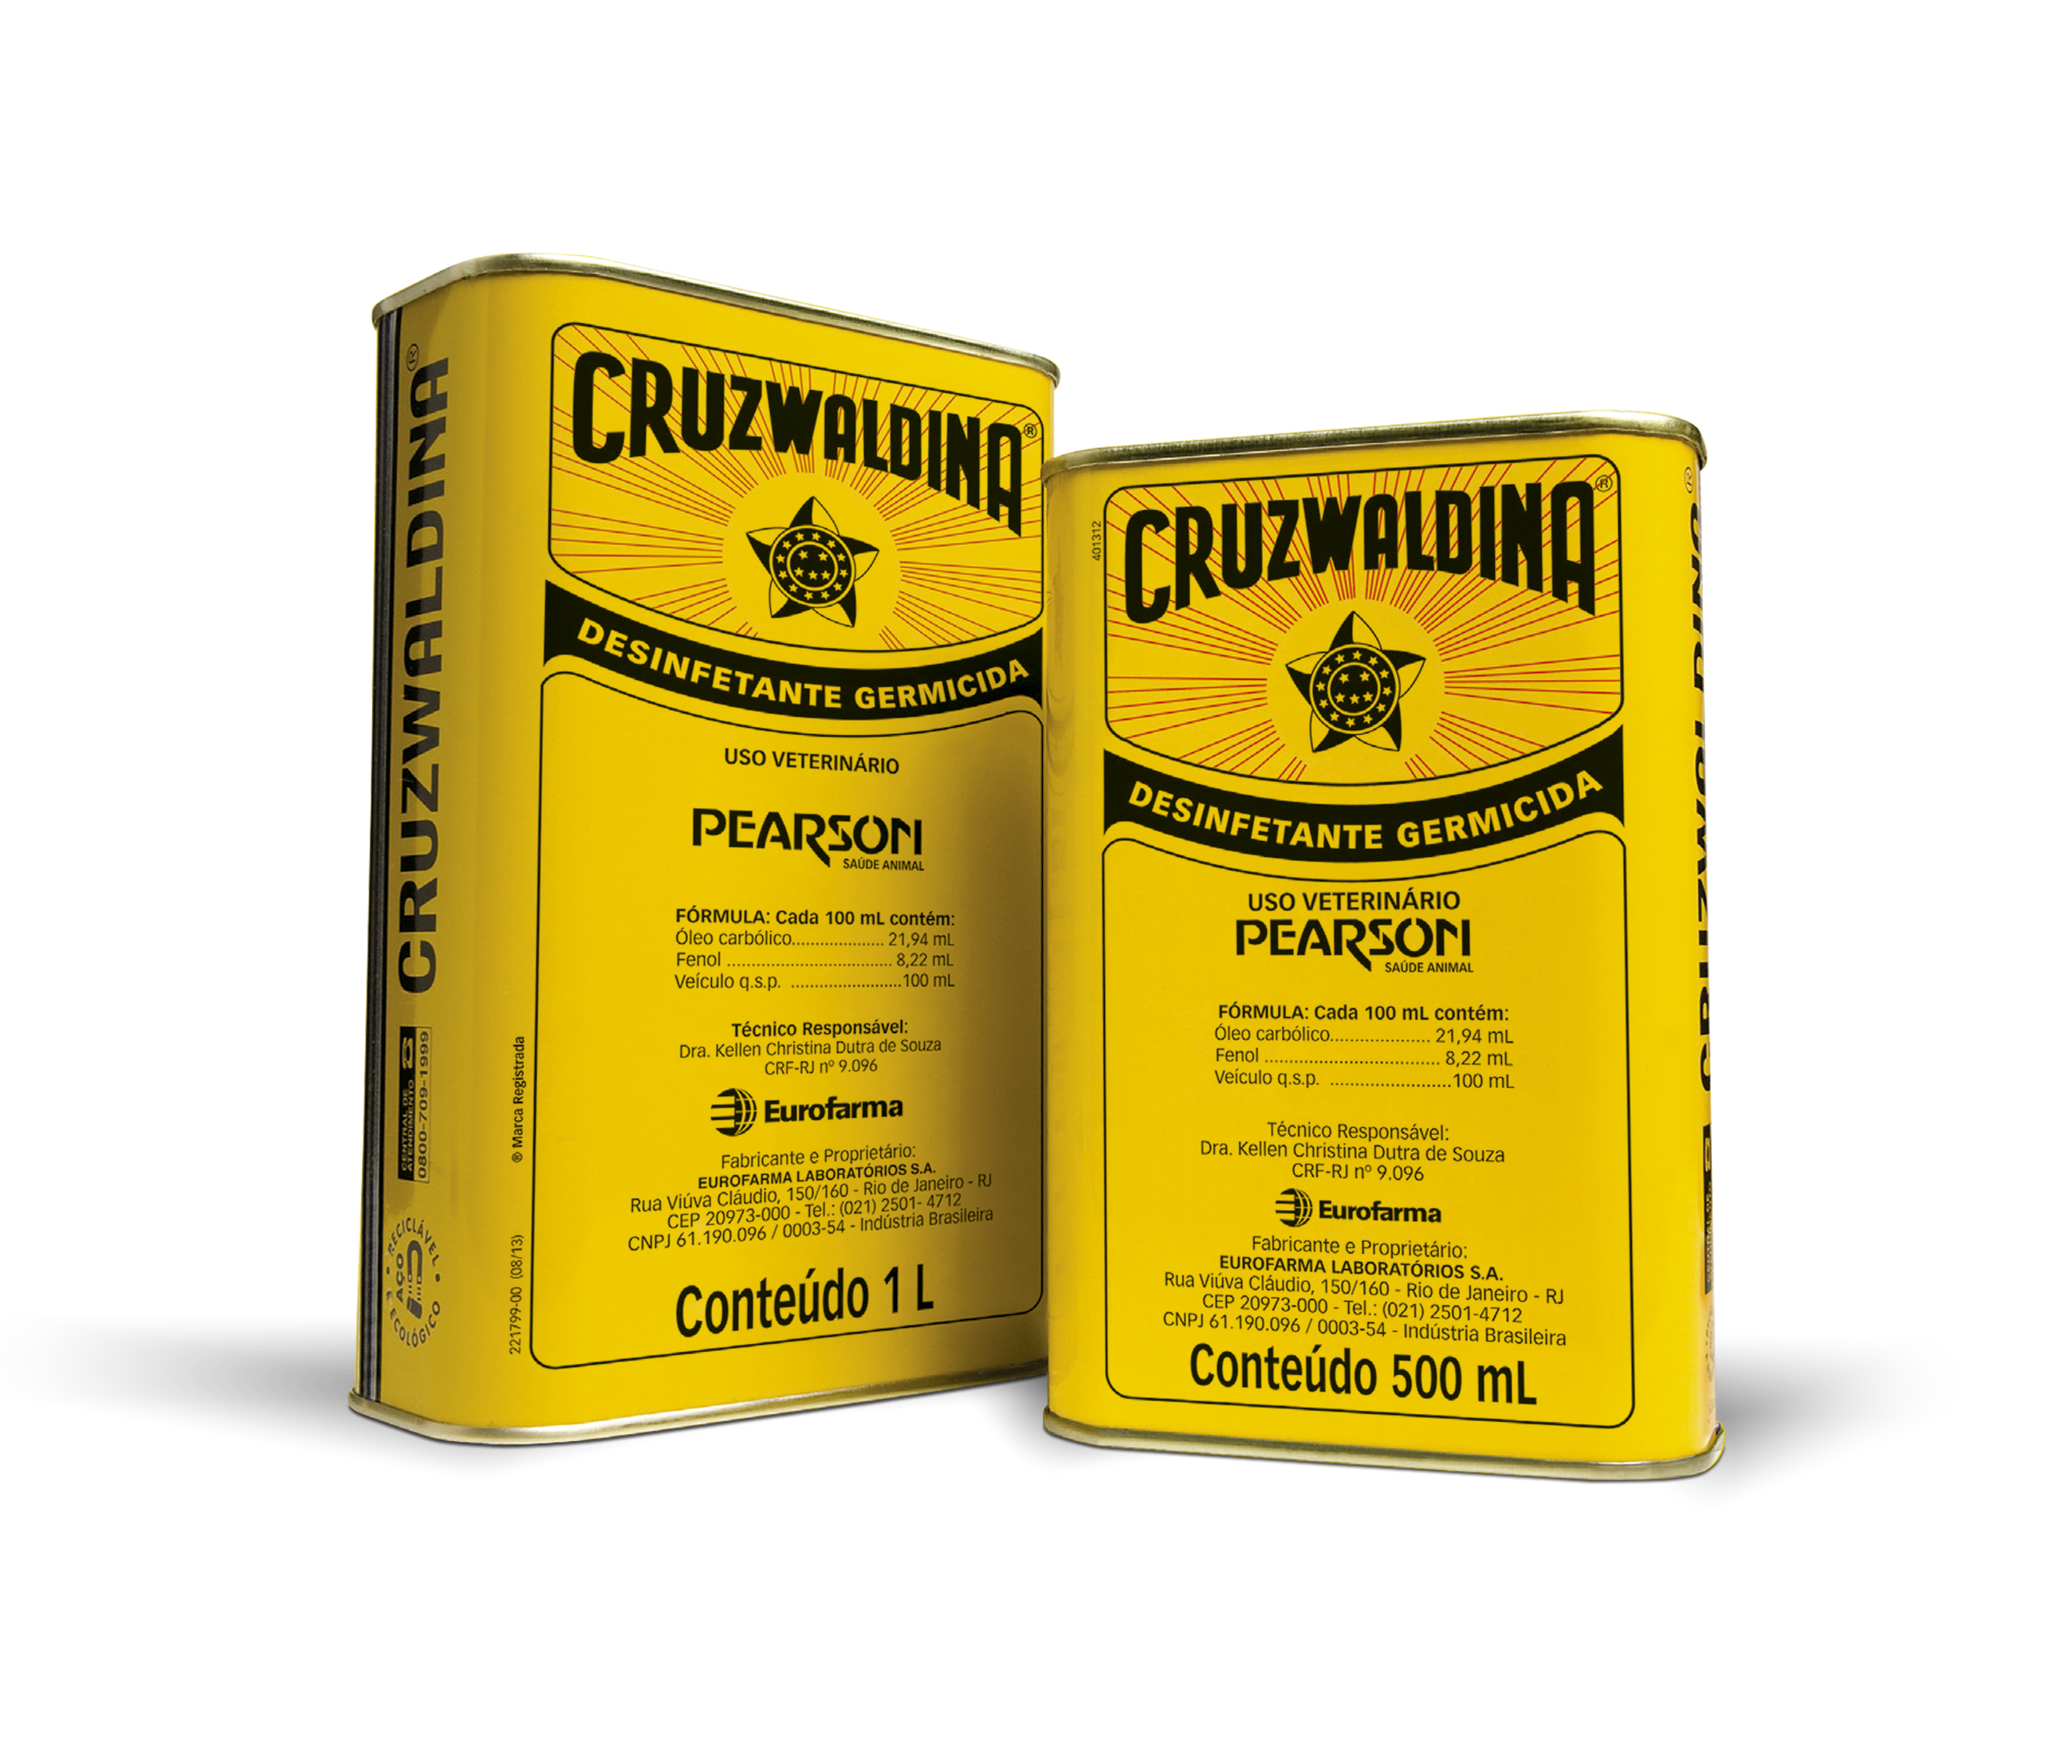 Cruzwaldina